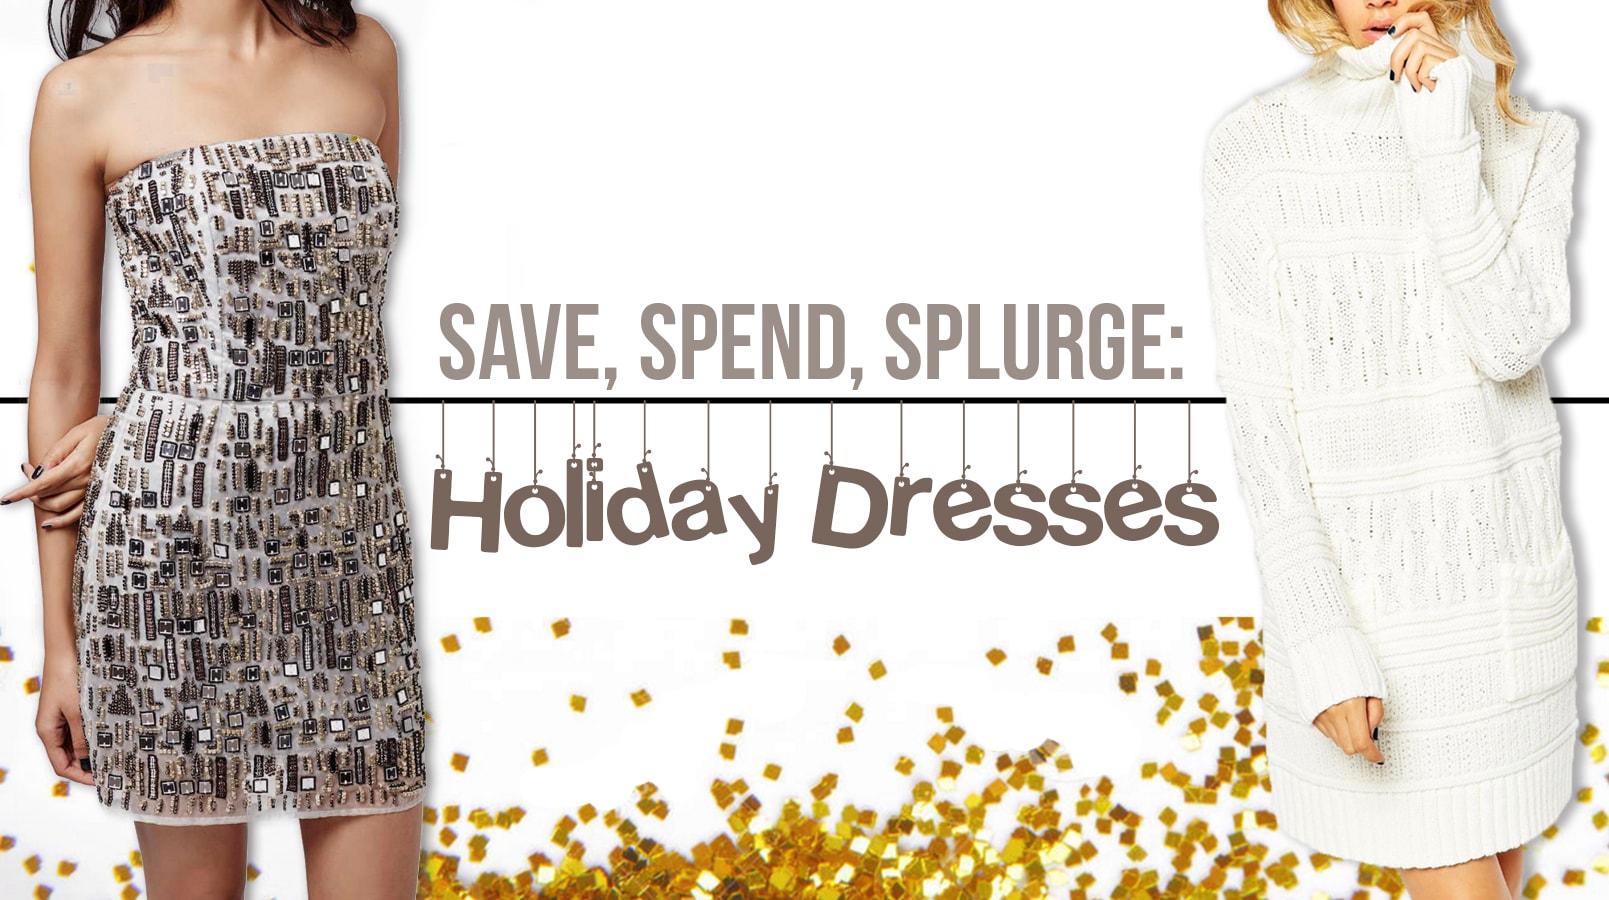 holiday dress header